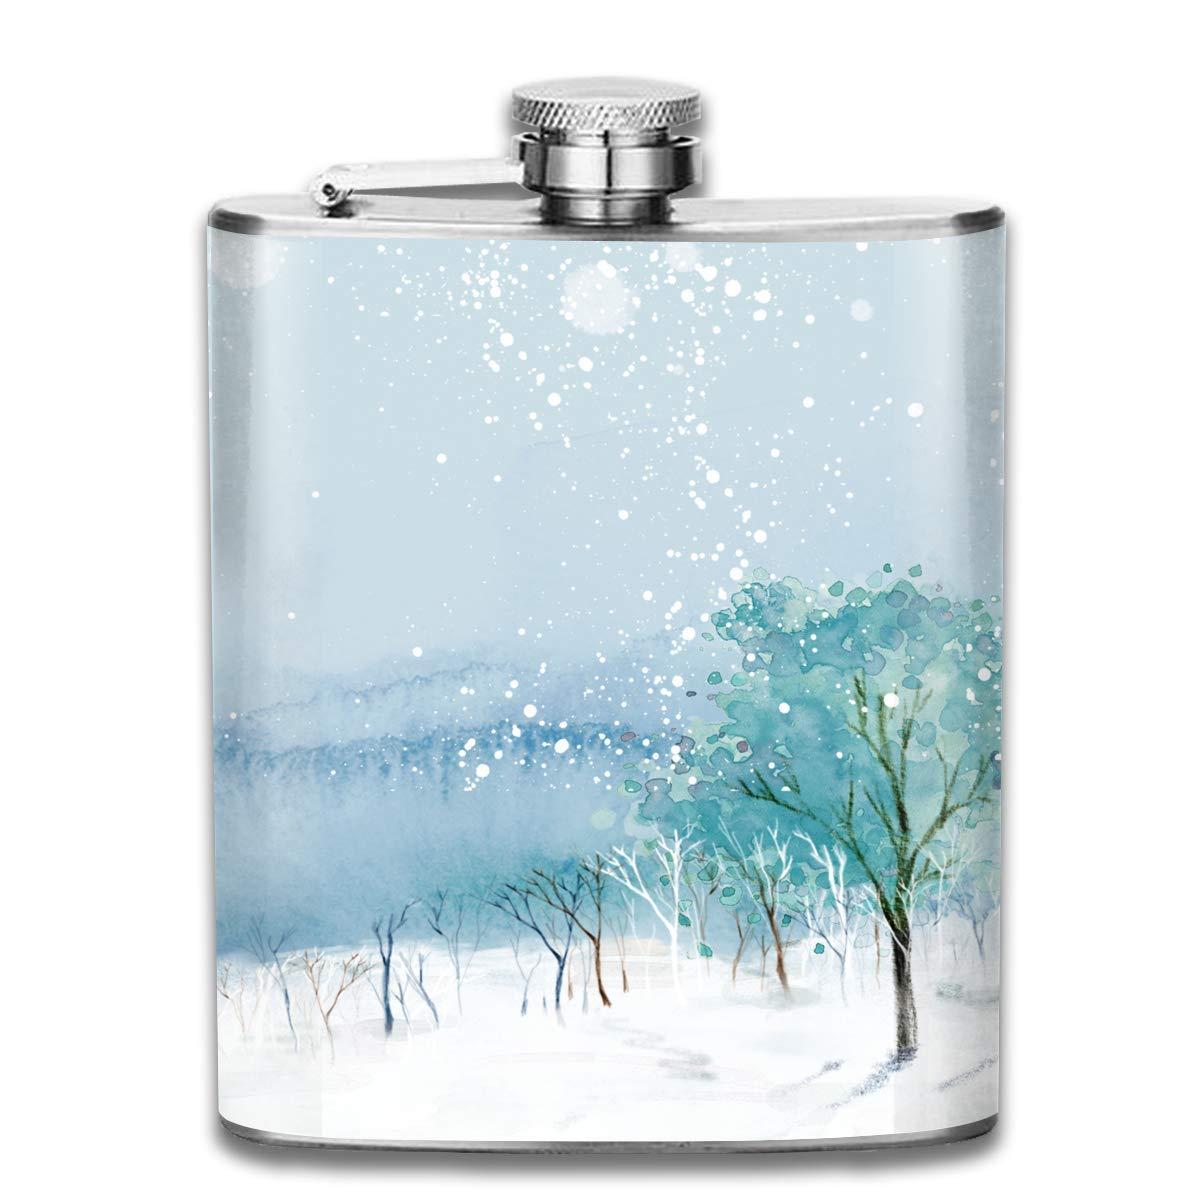 Snow Blue Sky Tree 3D Print Hip Bottle 7oz Portable Pocket Bottle Bag Bottle Camping Stainless Steel Wine Bottle Suitable Unisex